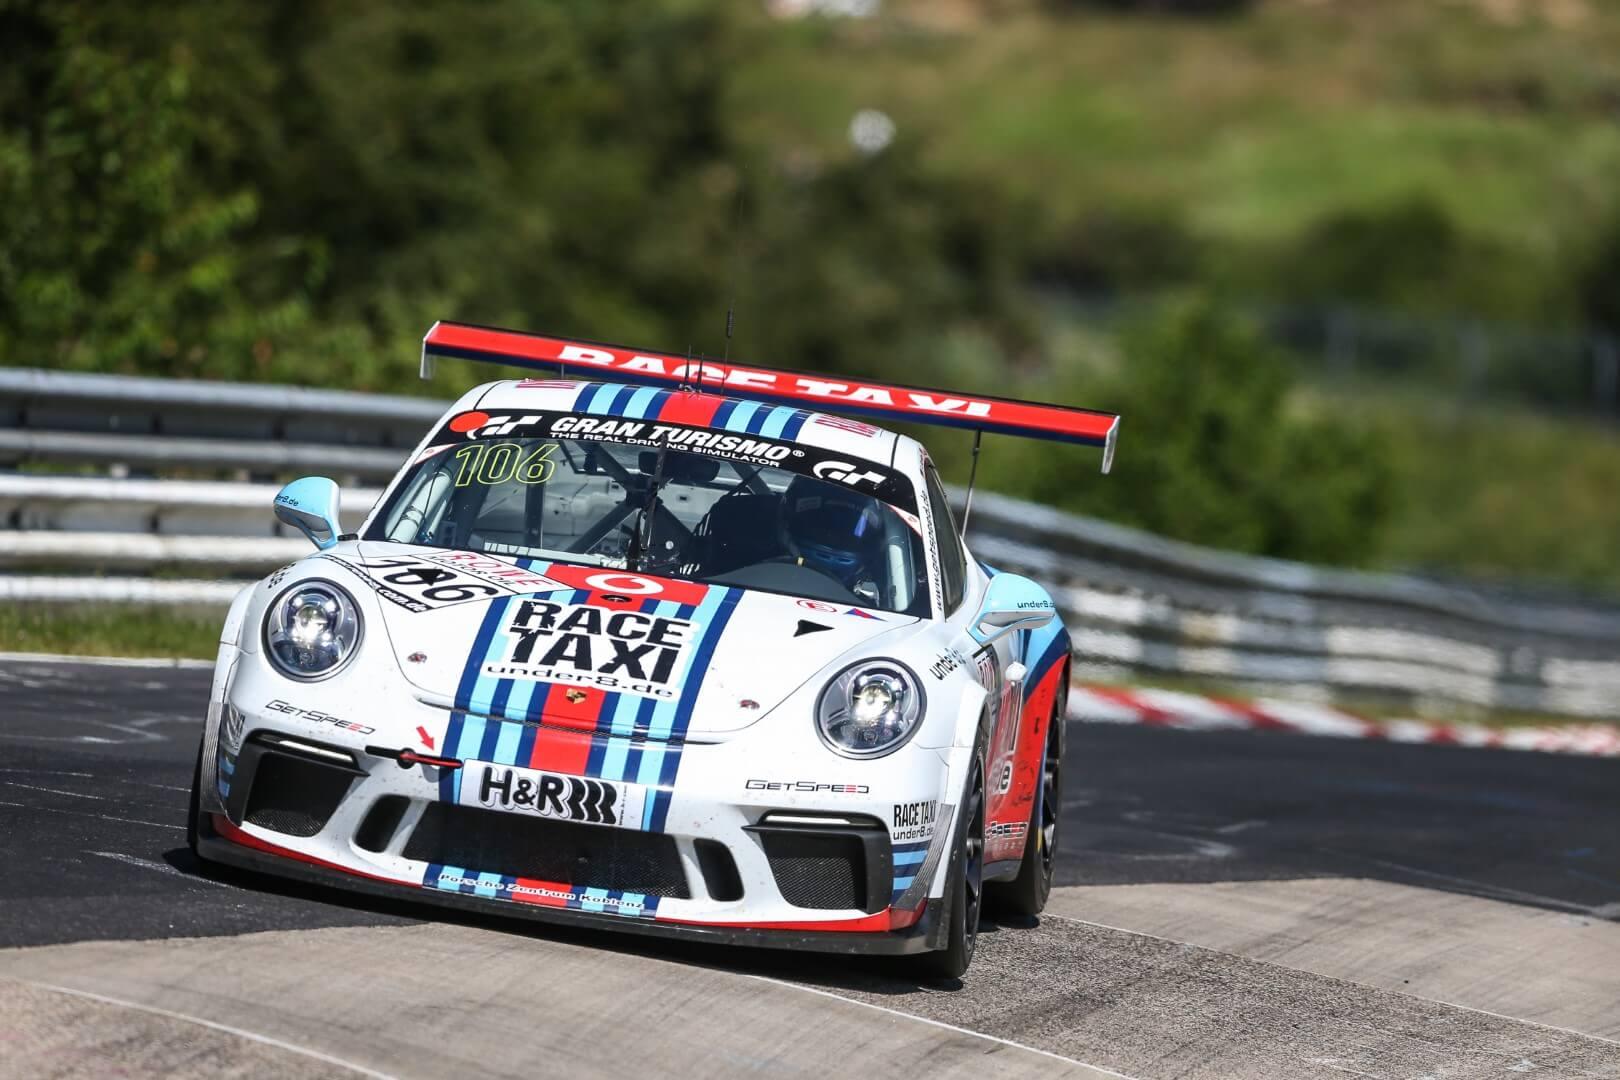 VLN 4. Lauf 2018, Nürburgring-Nordschleife - Foto: Gruppe C Photography; #106 Porsche 911 GT3 Cup, GIGASPEED Team GetSpeed Performance: Philip Hamprecht, Manuel Lauck, Fabian Schiller